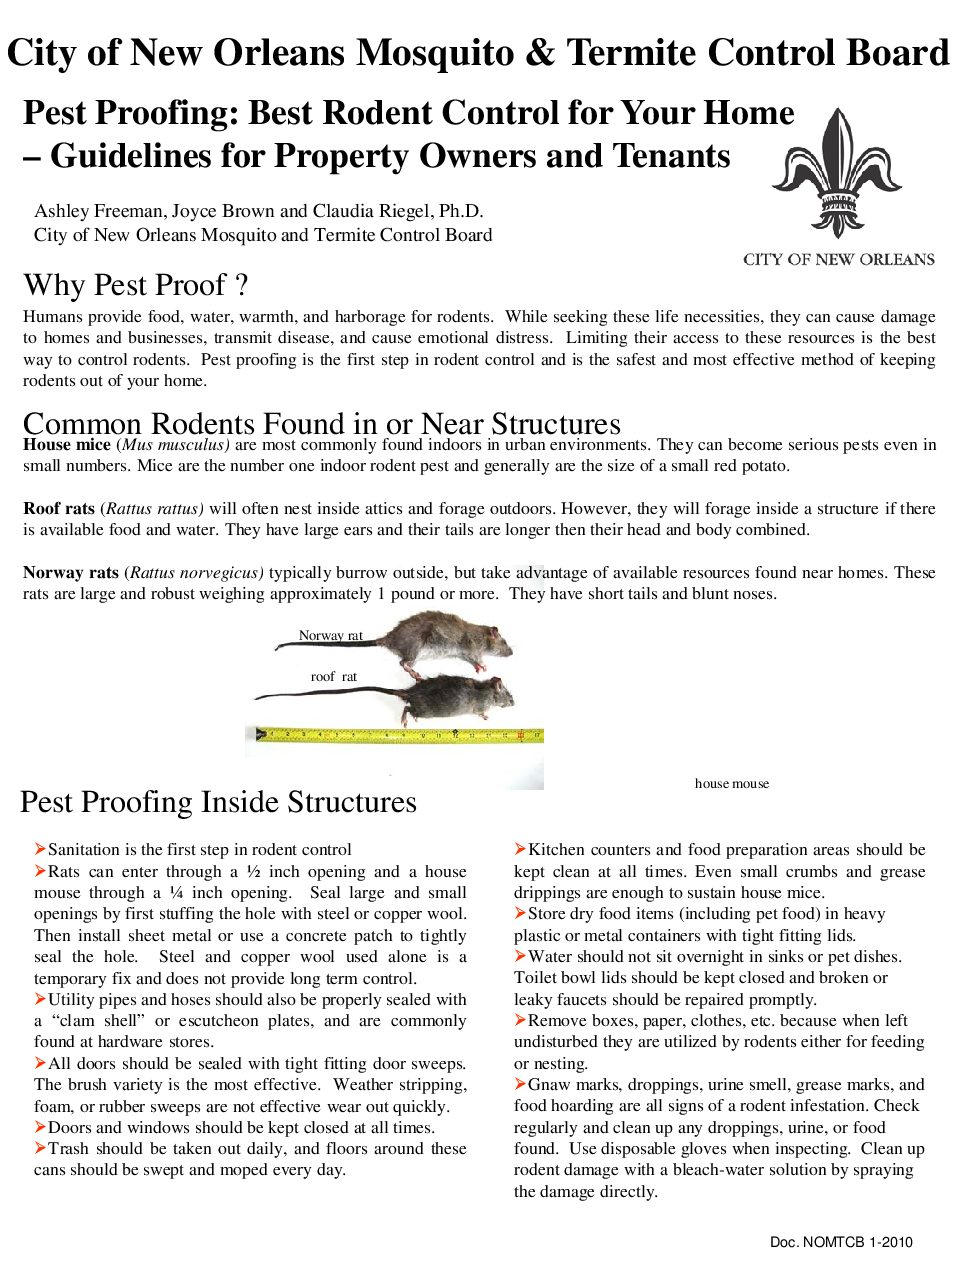 integrated pest management manual pdf